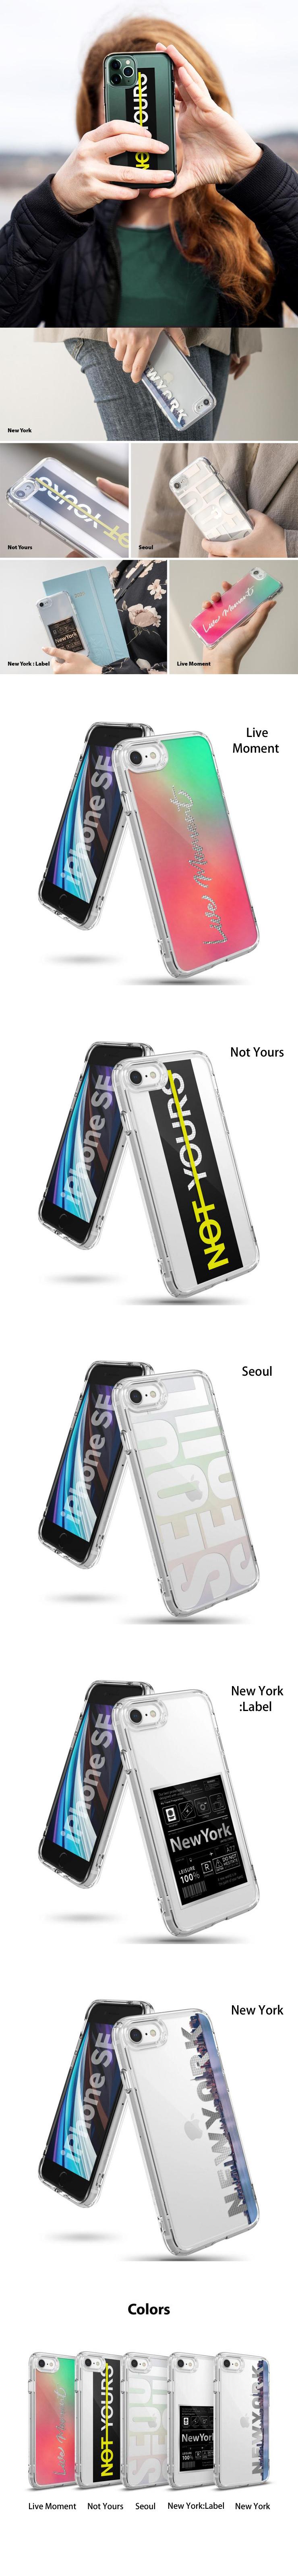 Ringke Fusion Design iPhone SE2